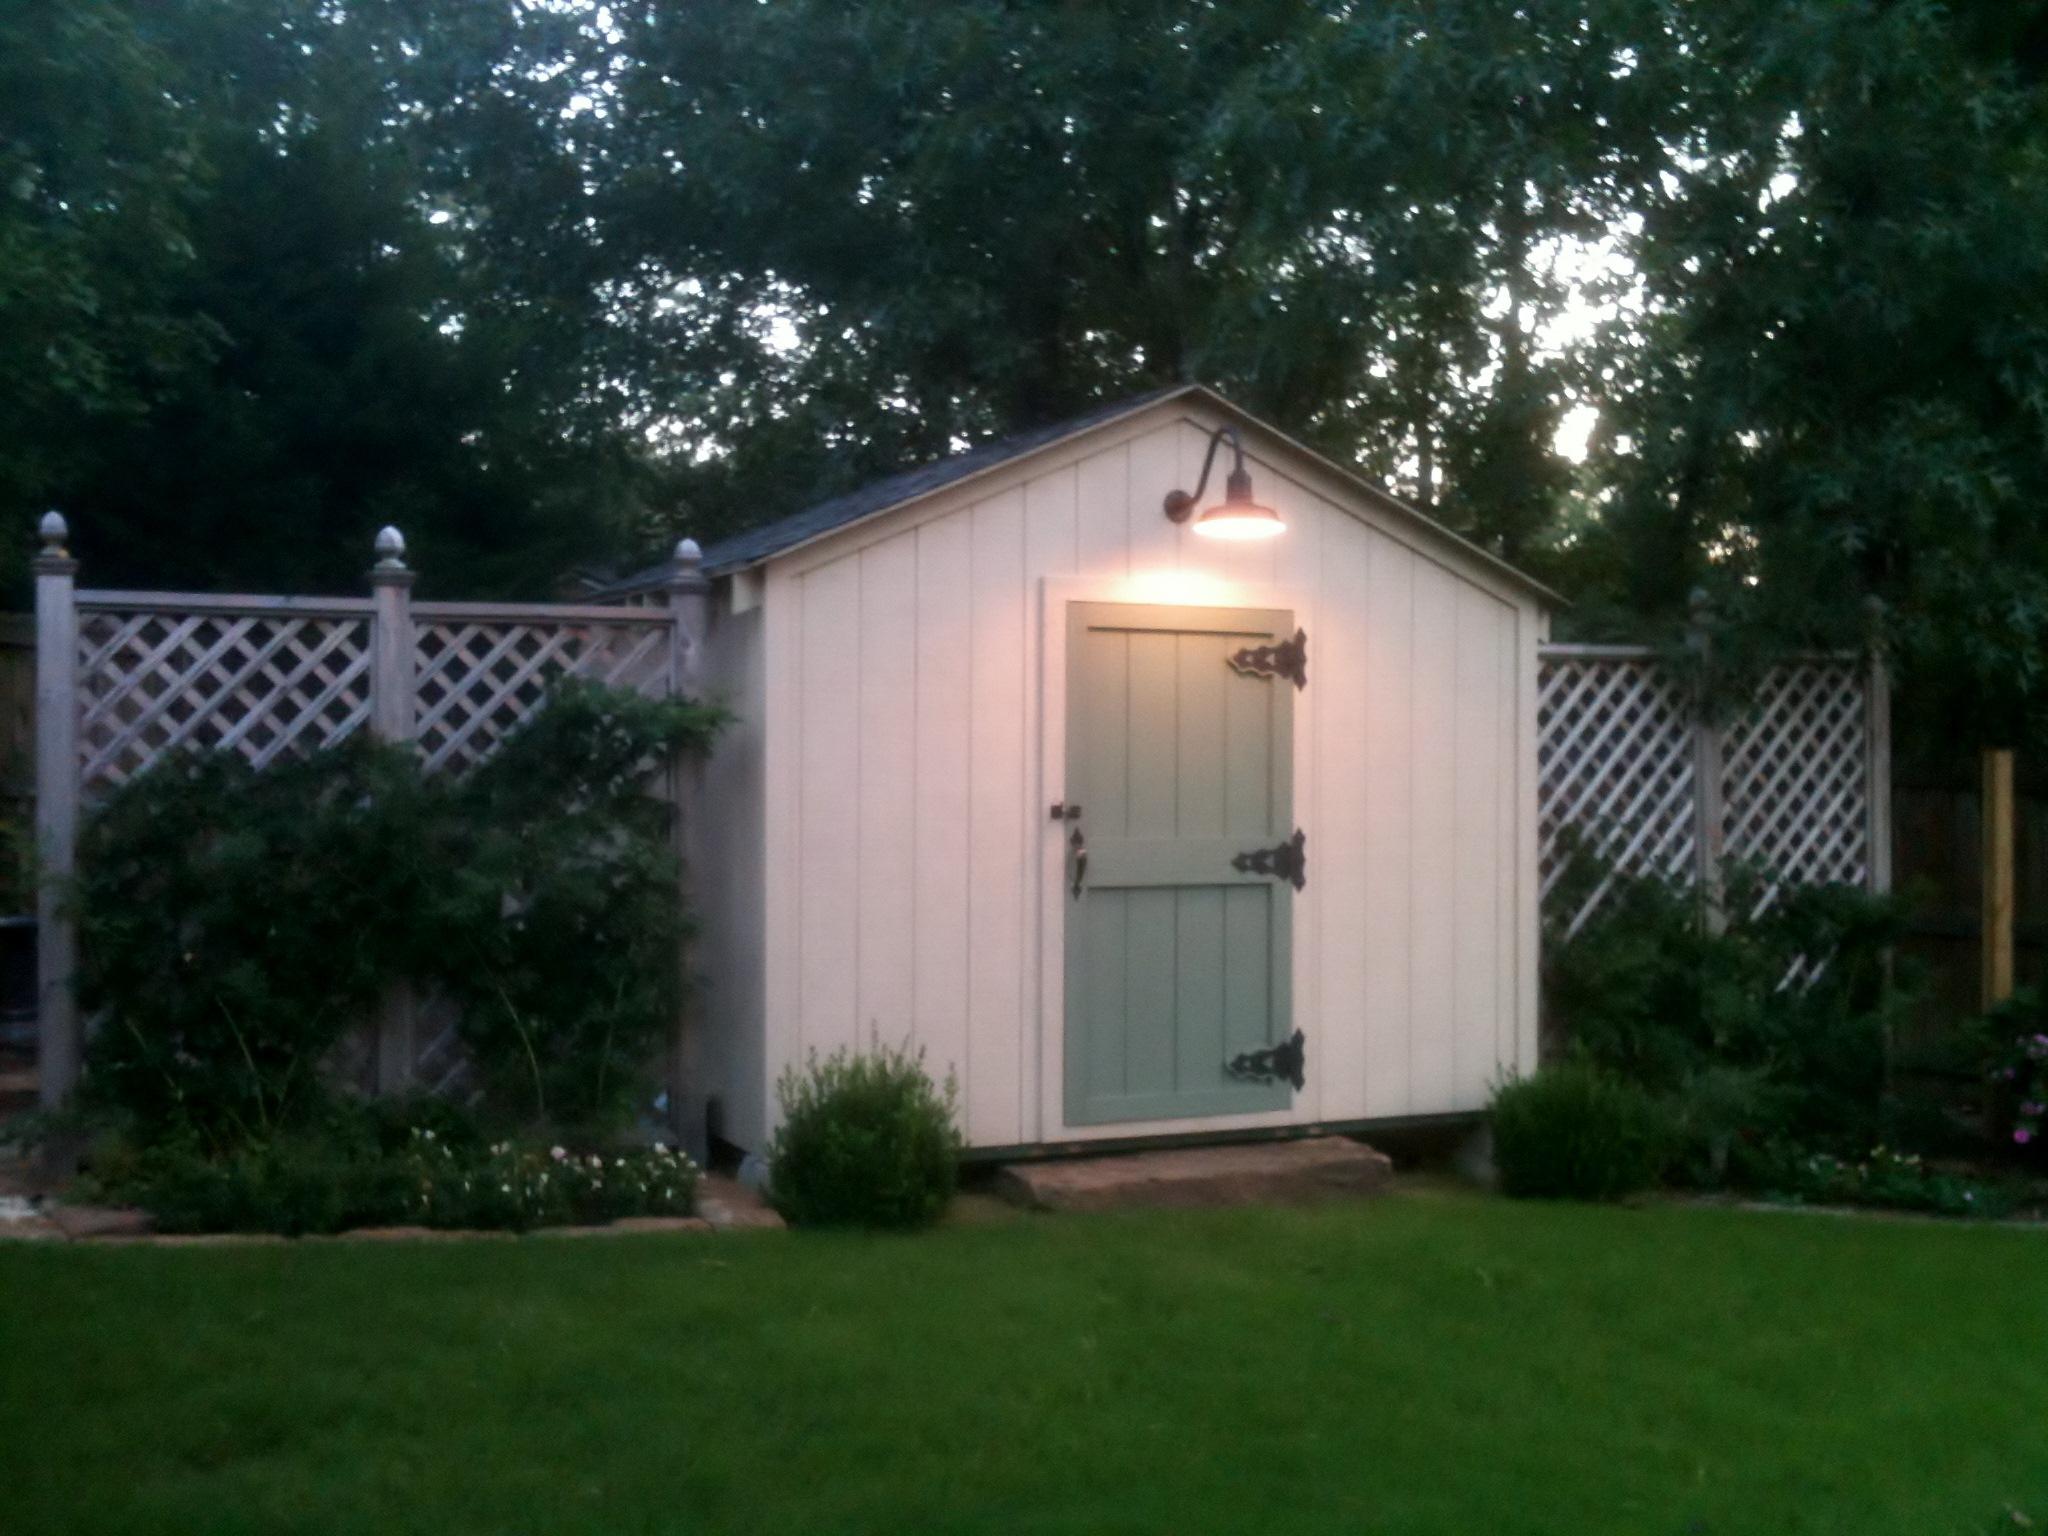 Gooseneck Barn Light Adds Delightful Farm Touch To Garden Shed Blog BarnL